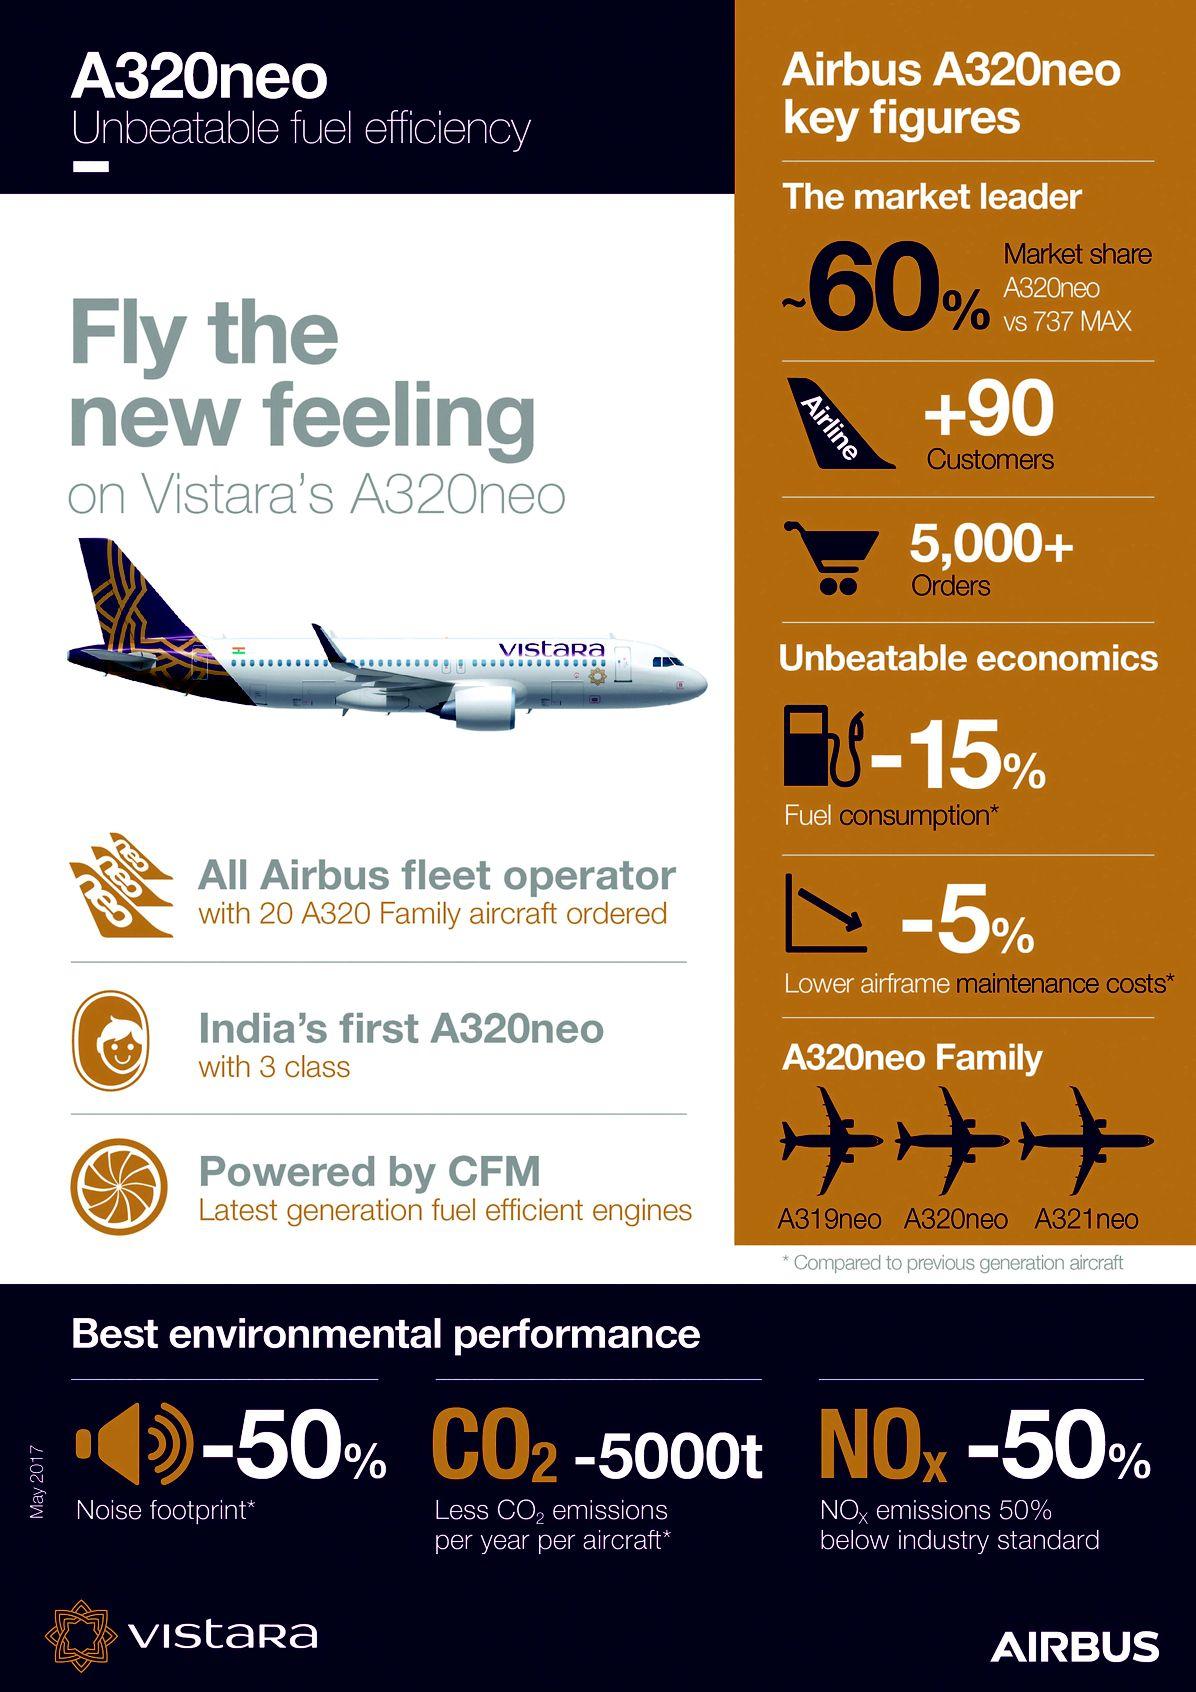 2016xxxx_A321neo, A320neo_Vistara_Infographic_May 2017